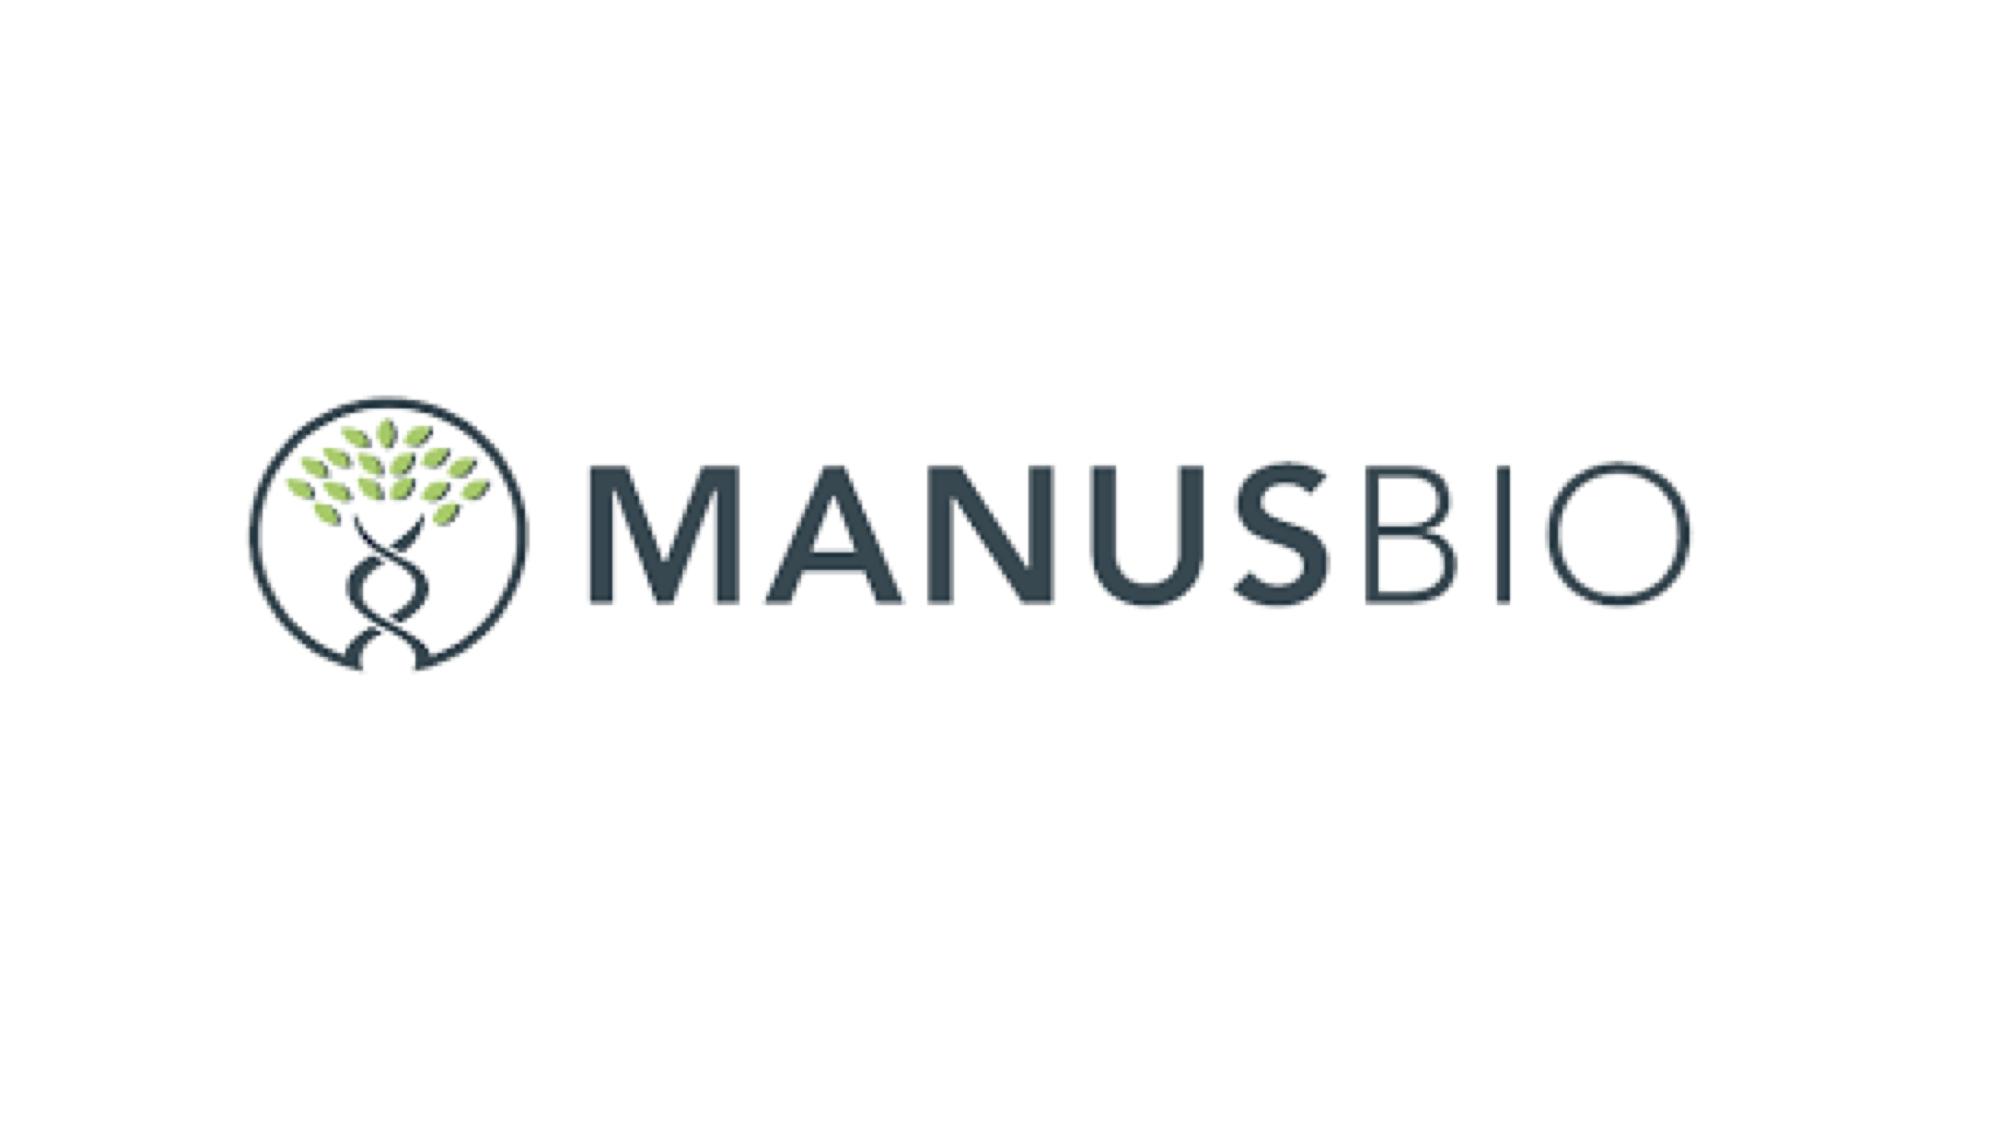 manusbio1.png